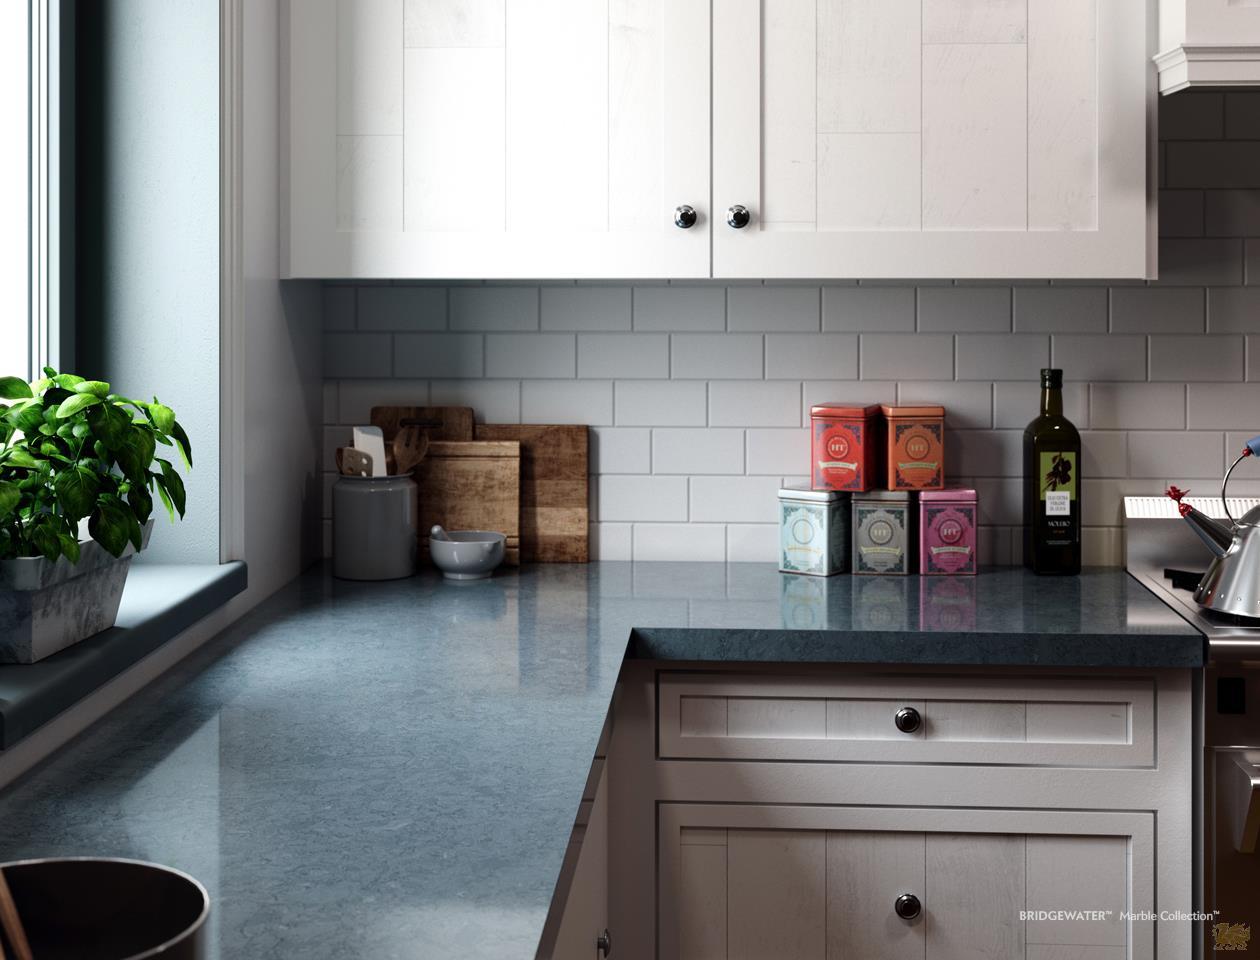 Featured Design: Bridgewater  link